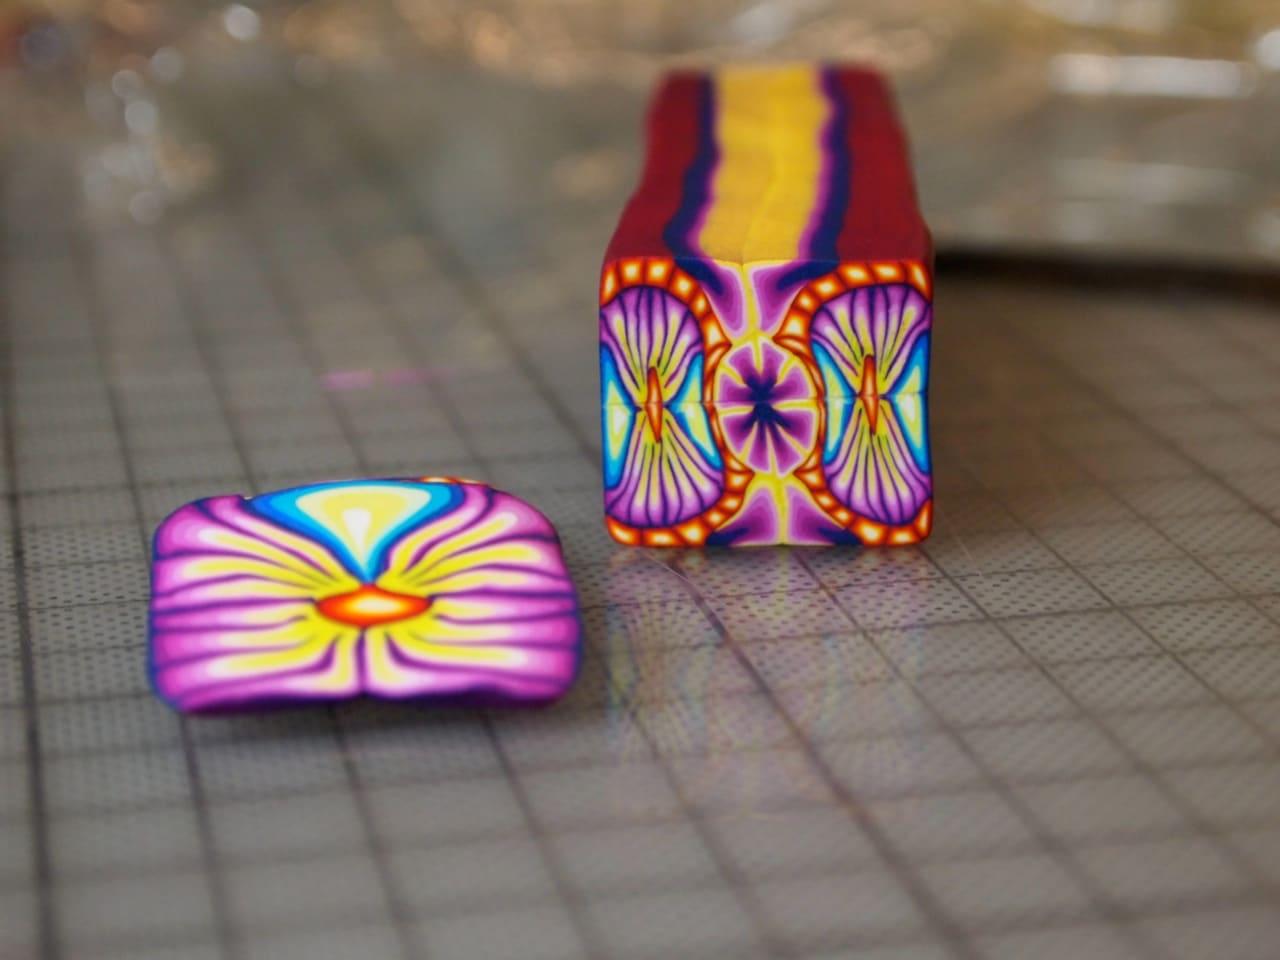 Wundersch ne fimo perlen selber machen bild erindzain for Fimo muttertagsgeschenk